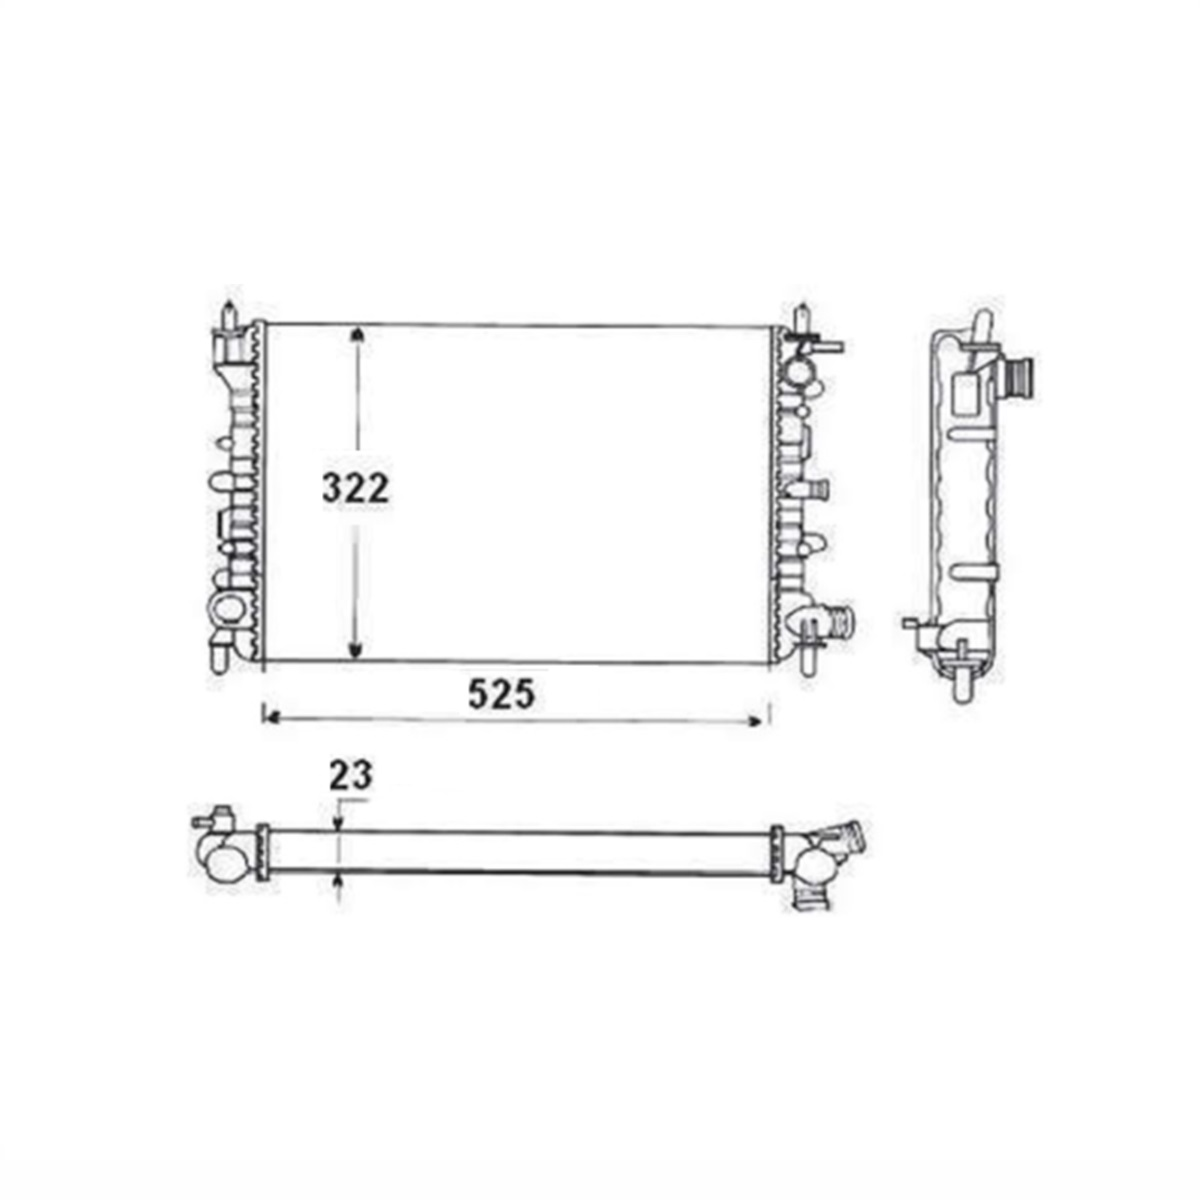 Radiador de Água Ford Escort 93/96, Volkswagen - Logus 93/96, Pointer 94/96 S/Ar Manual